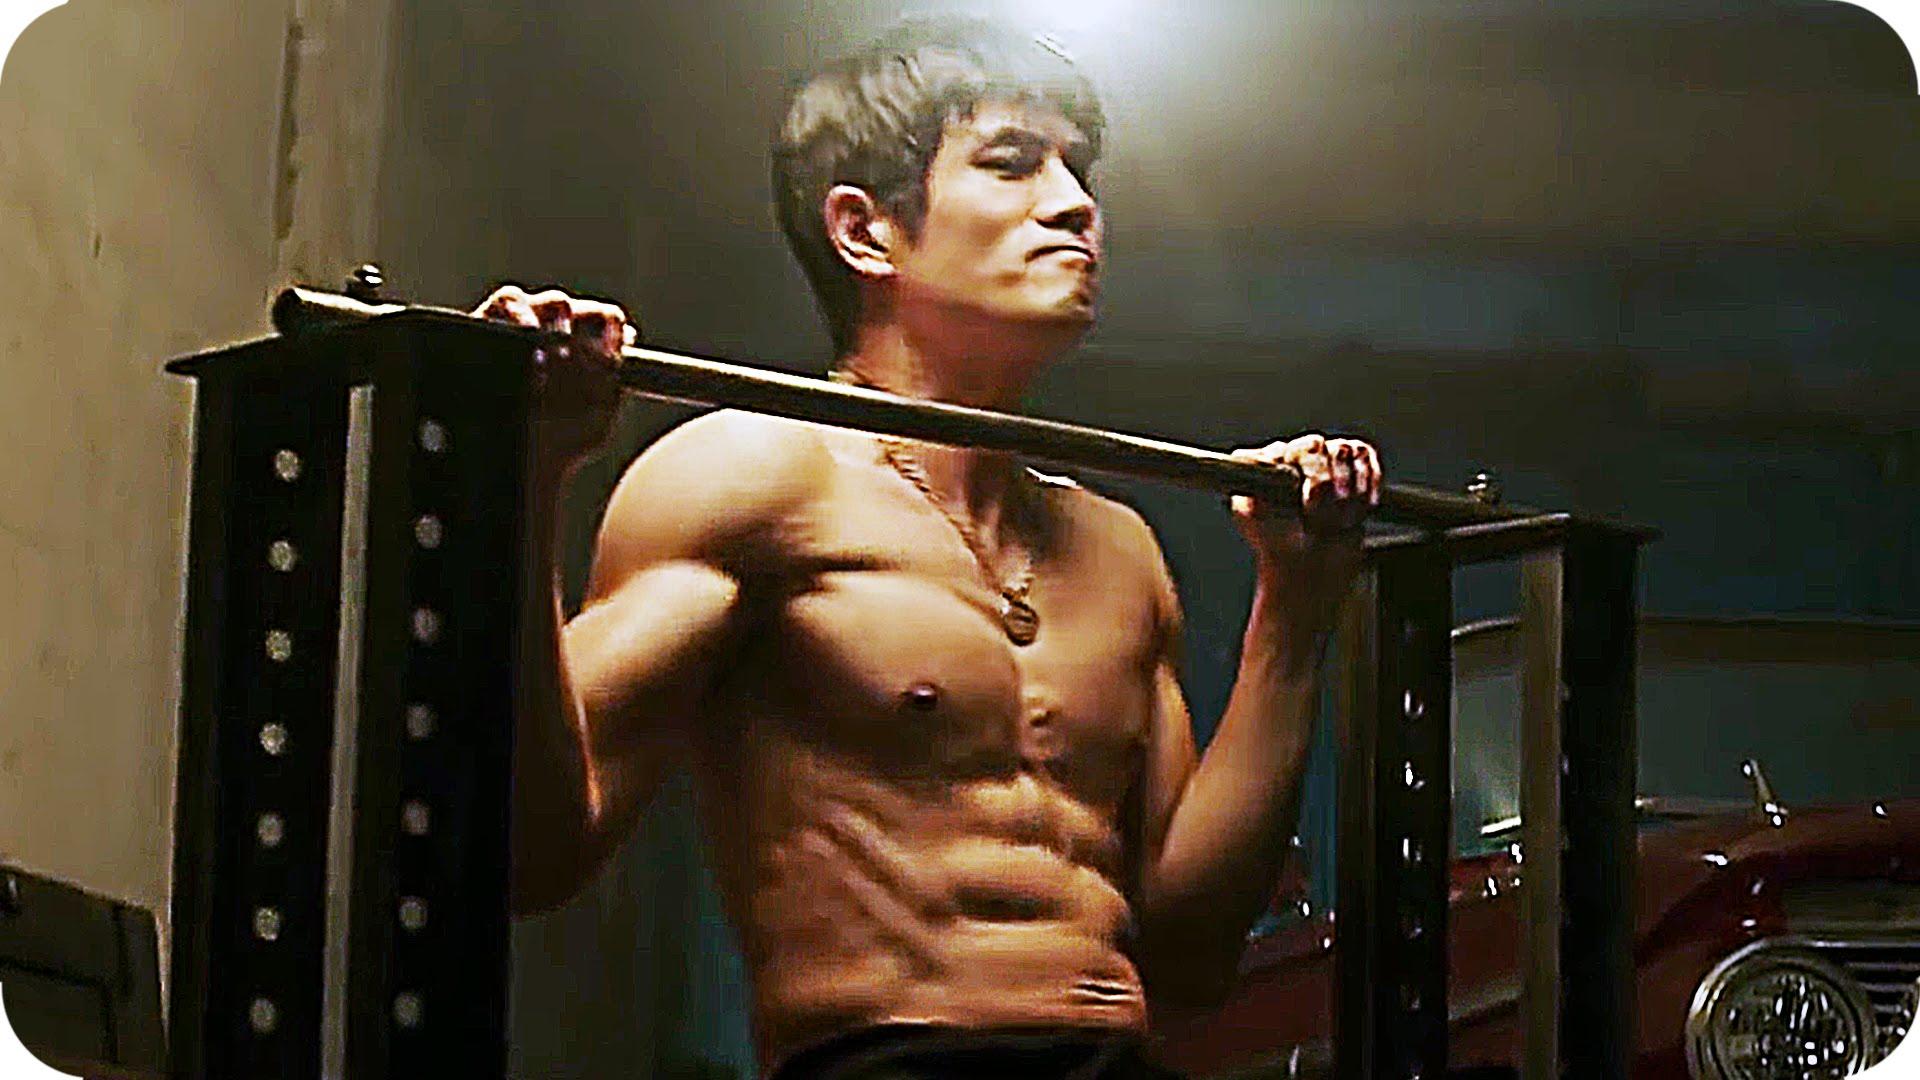 BIRTH OF THE DRAGON Trailer (2016) Bruce Lee Movie